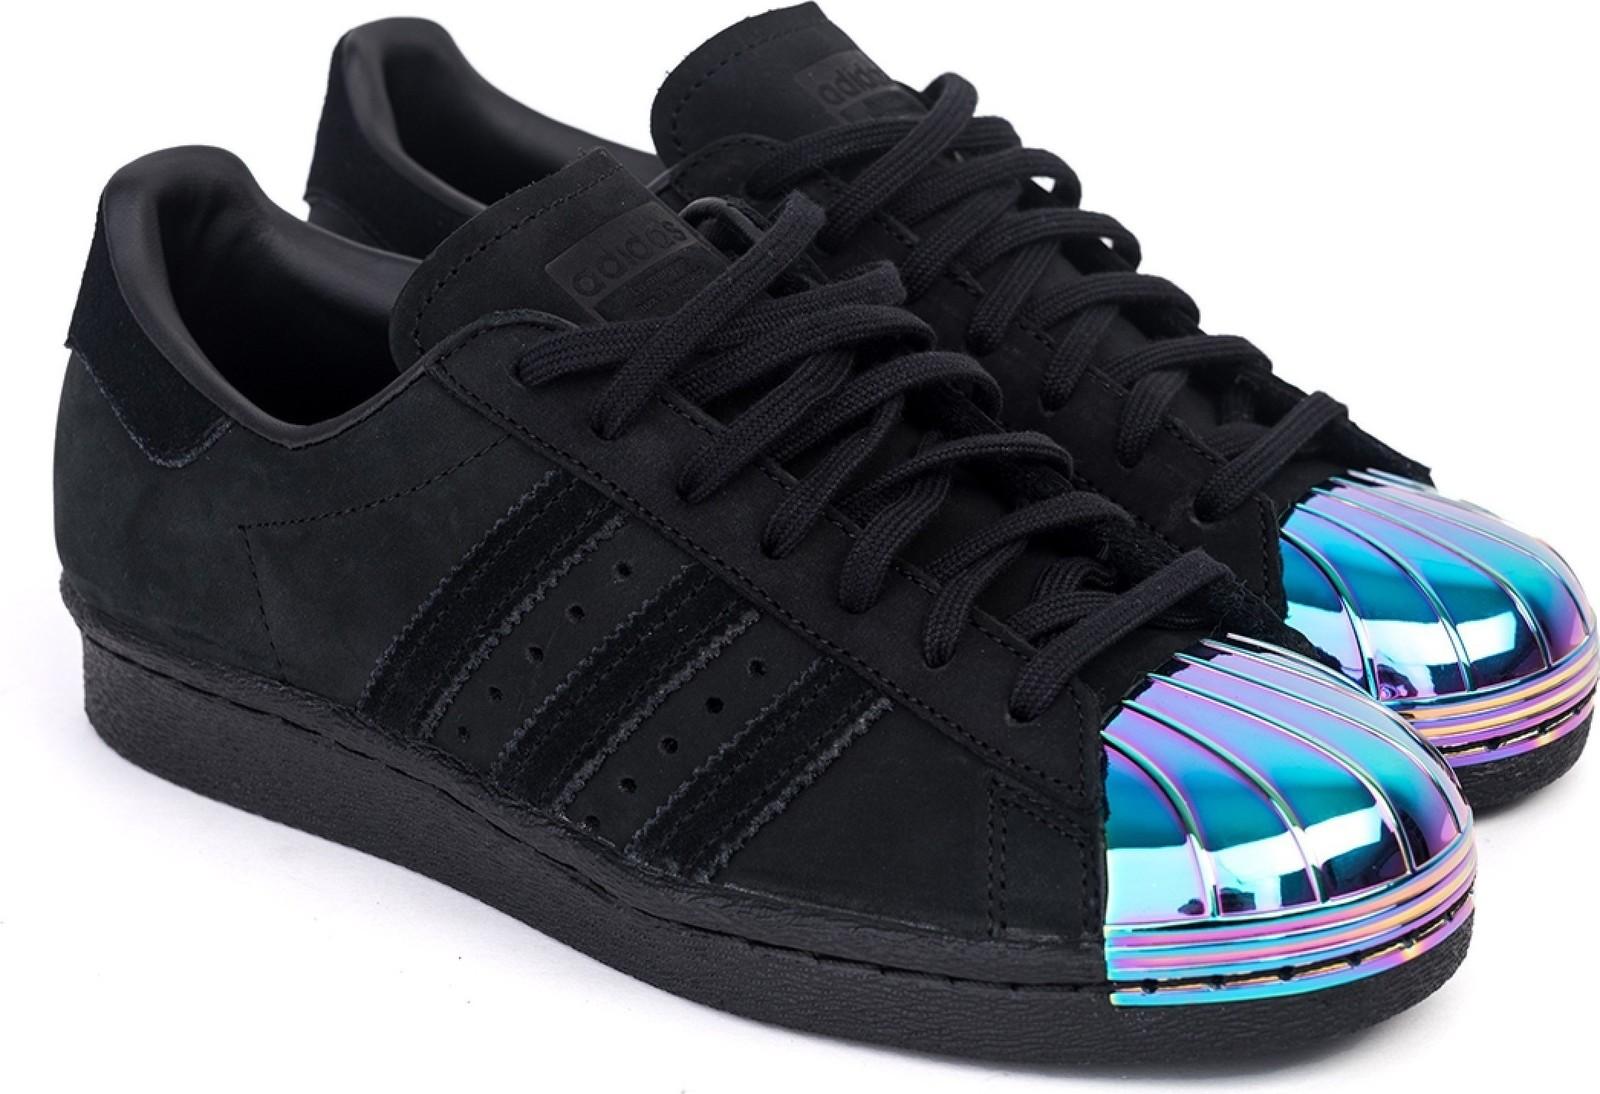 Adidas Metallic Toe Shoes